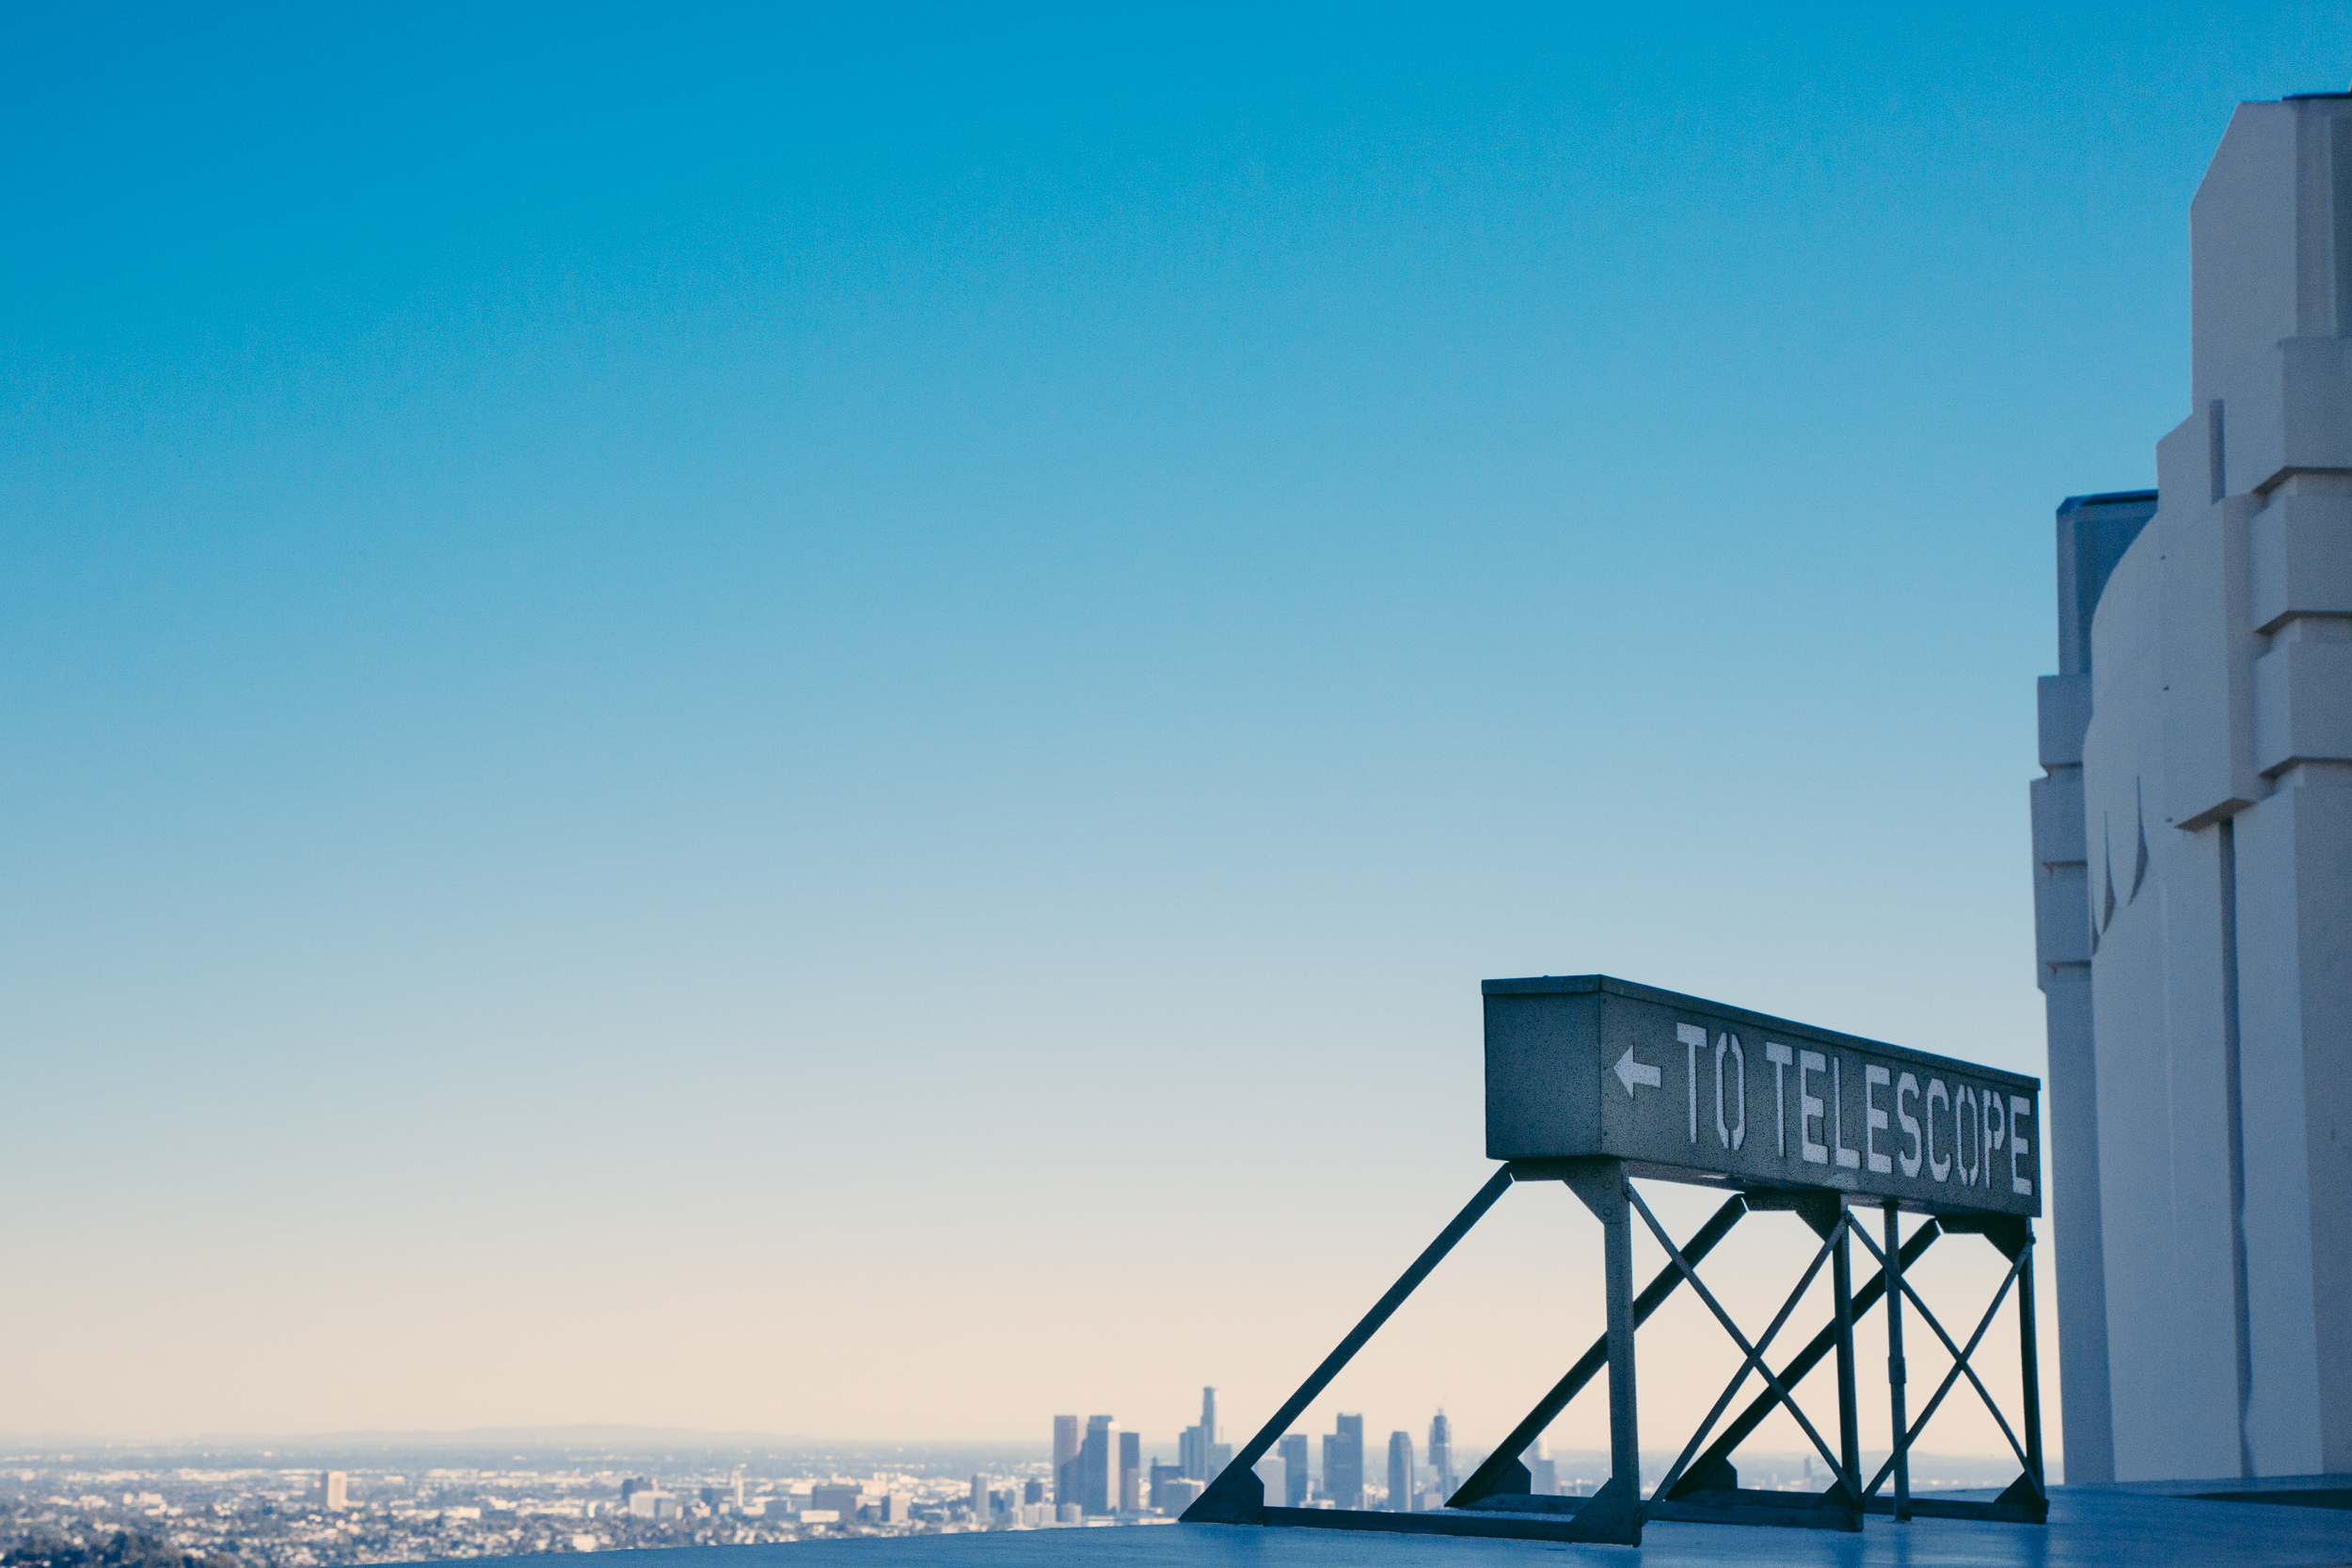 Los_Angeles_Travel_Photography_Laura_Suprenant-10.jpg